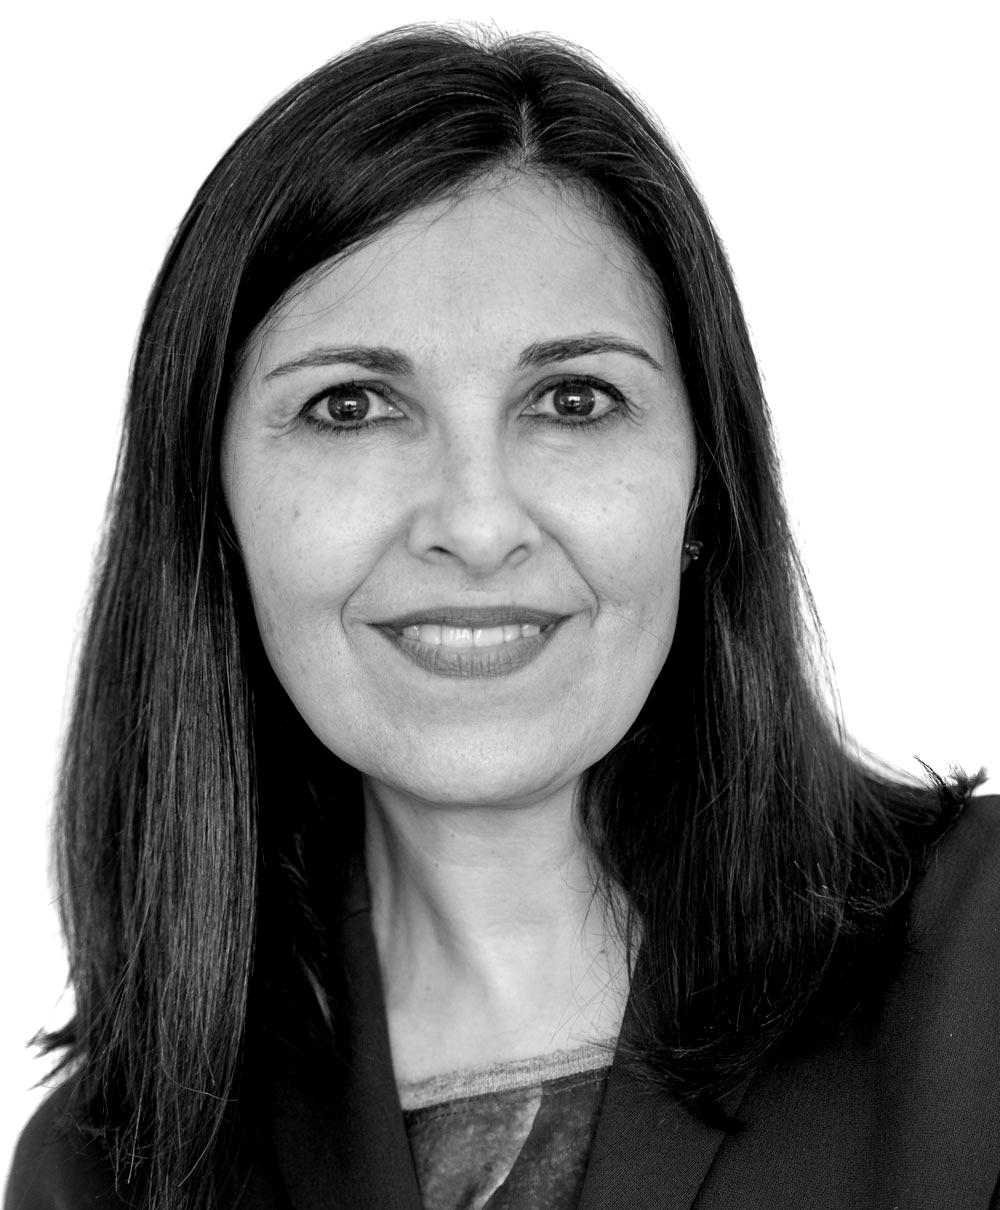 Headshot of Filomena Monteiro